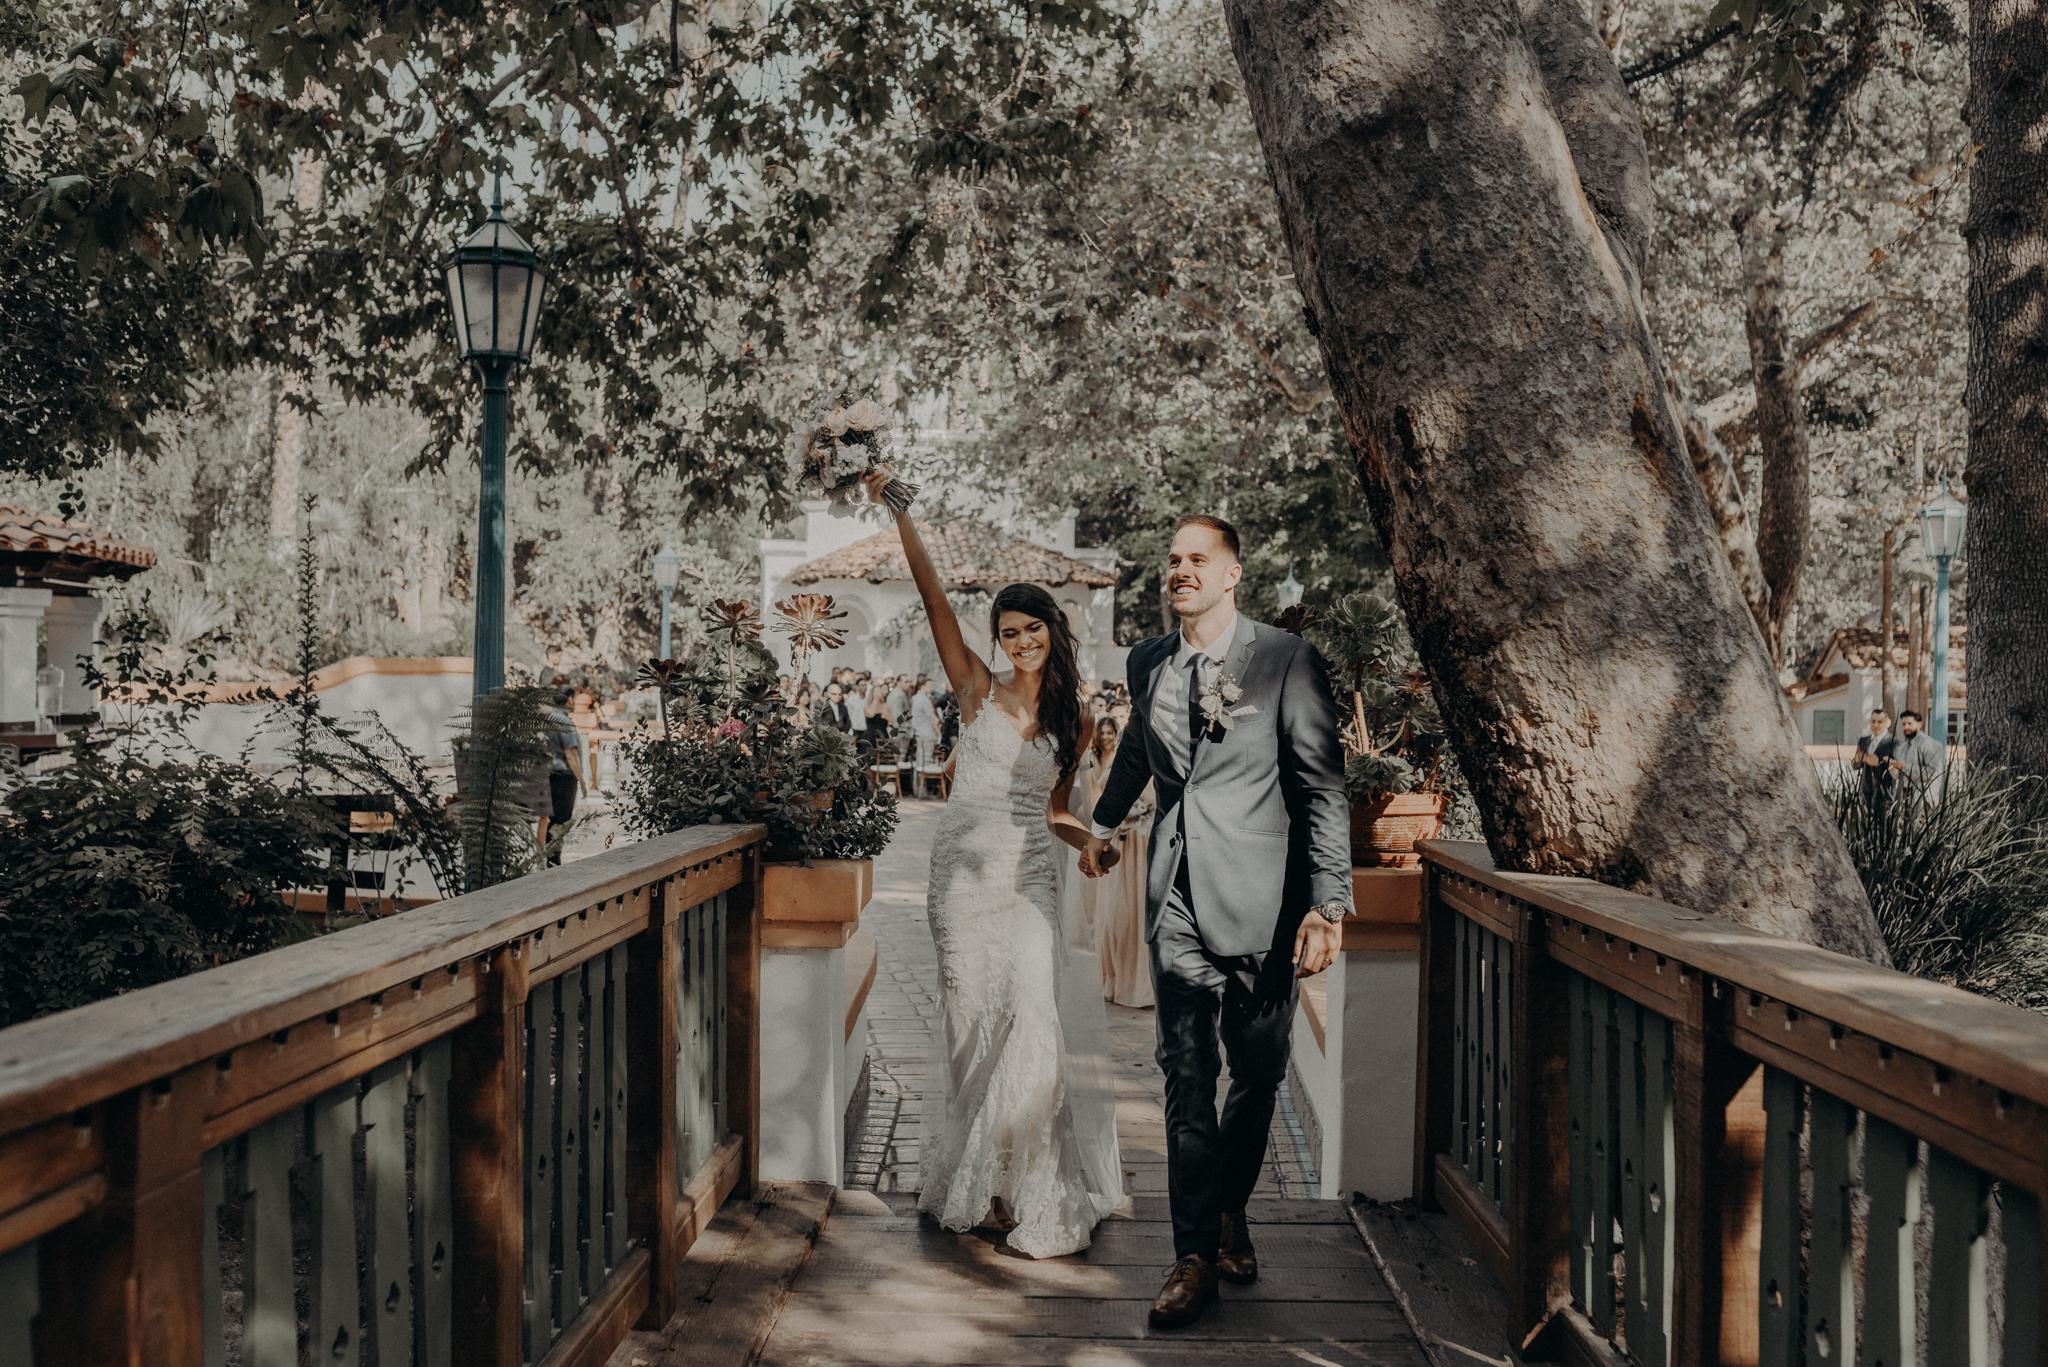 Isaiah + Taylor Photography - Rancho Las Lomas Wedding, Los Angeles Wedding Photographer-069.jpg